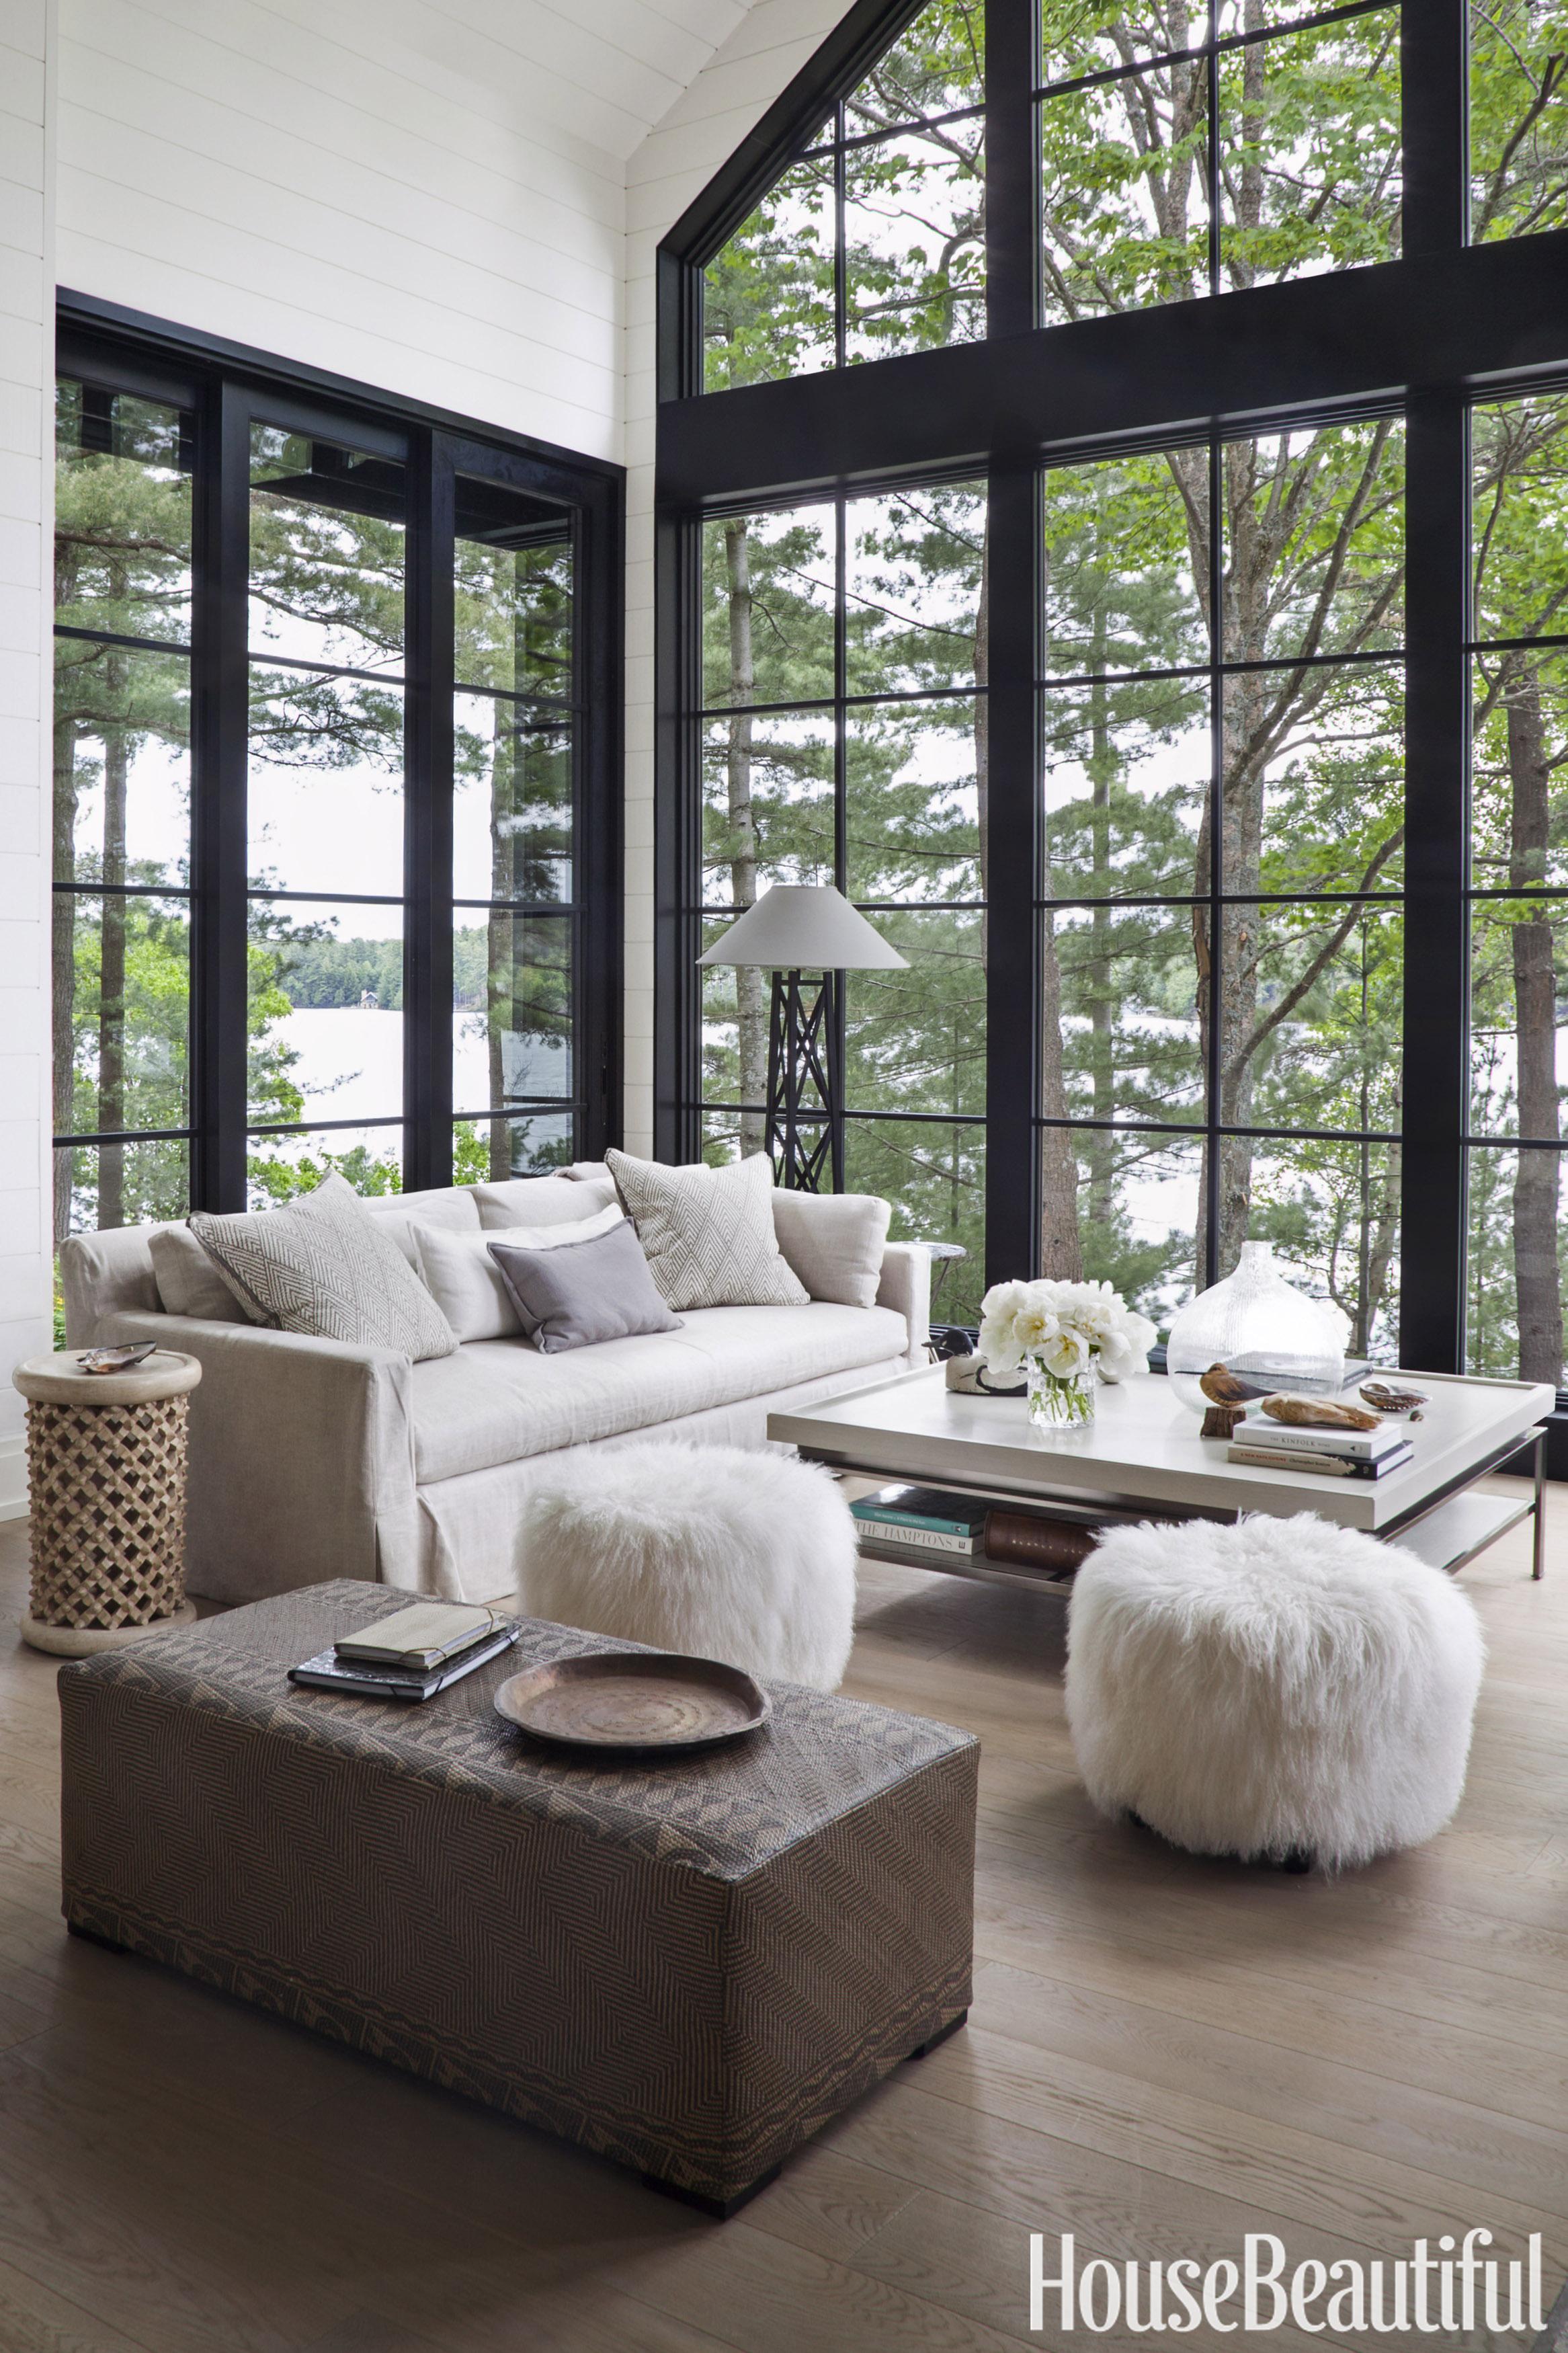 Summer House Interior Design Ideas From Berlin: 50 Summer House Interior Design Ideas